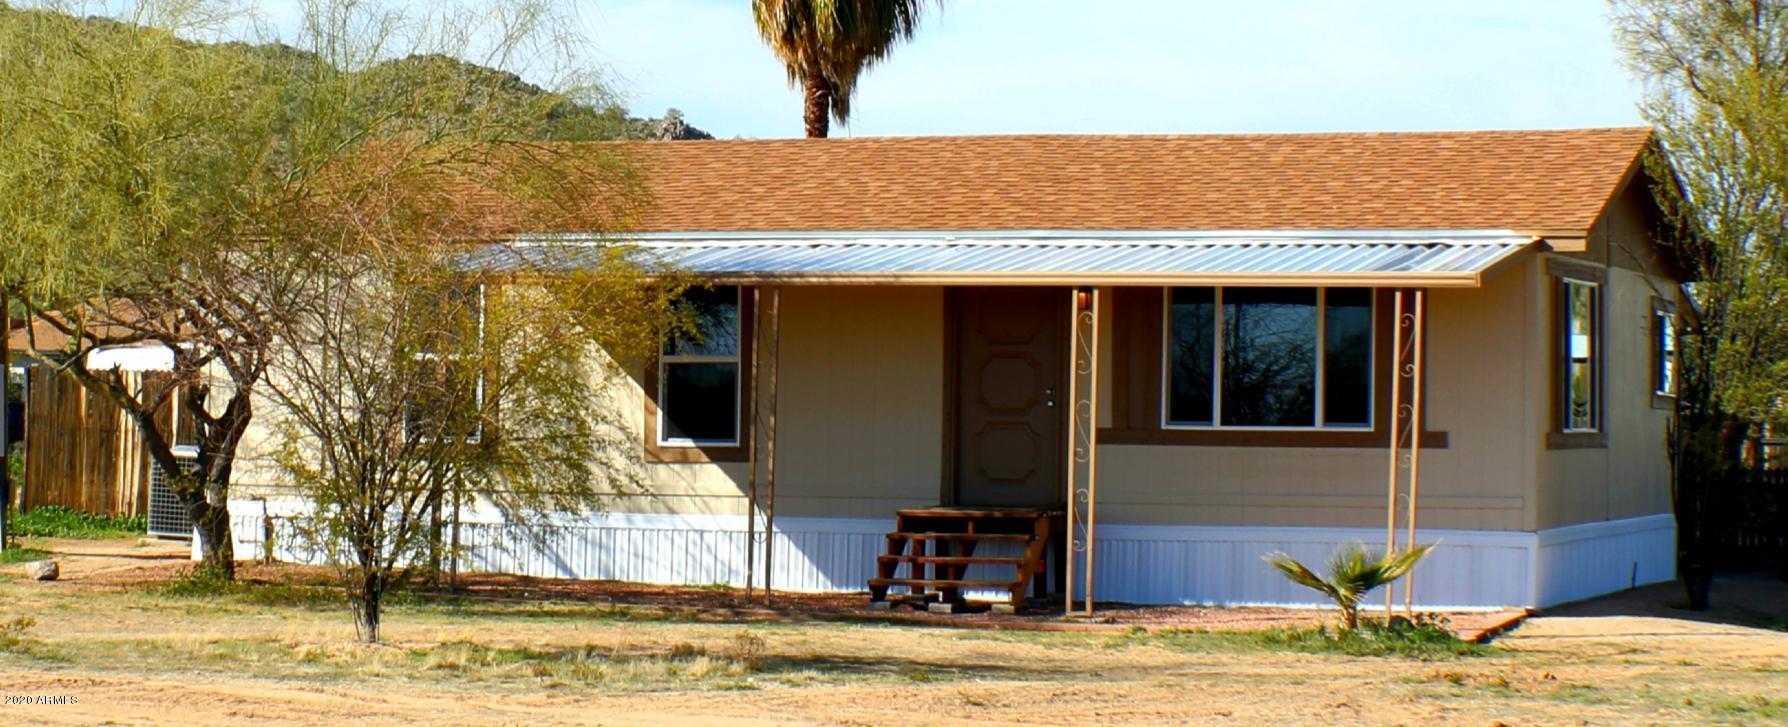 Photo of 3112 W IVAR Road, Queen Creek, AZ 85142